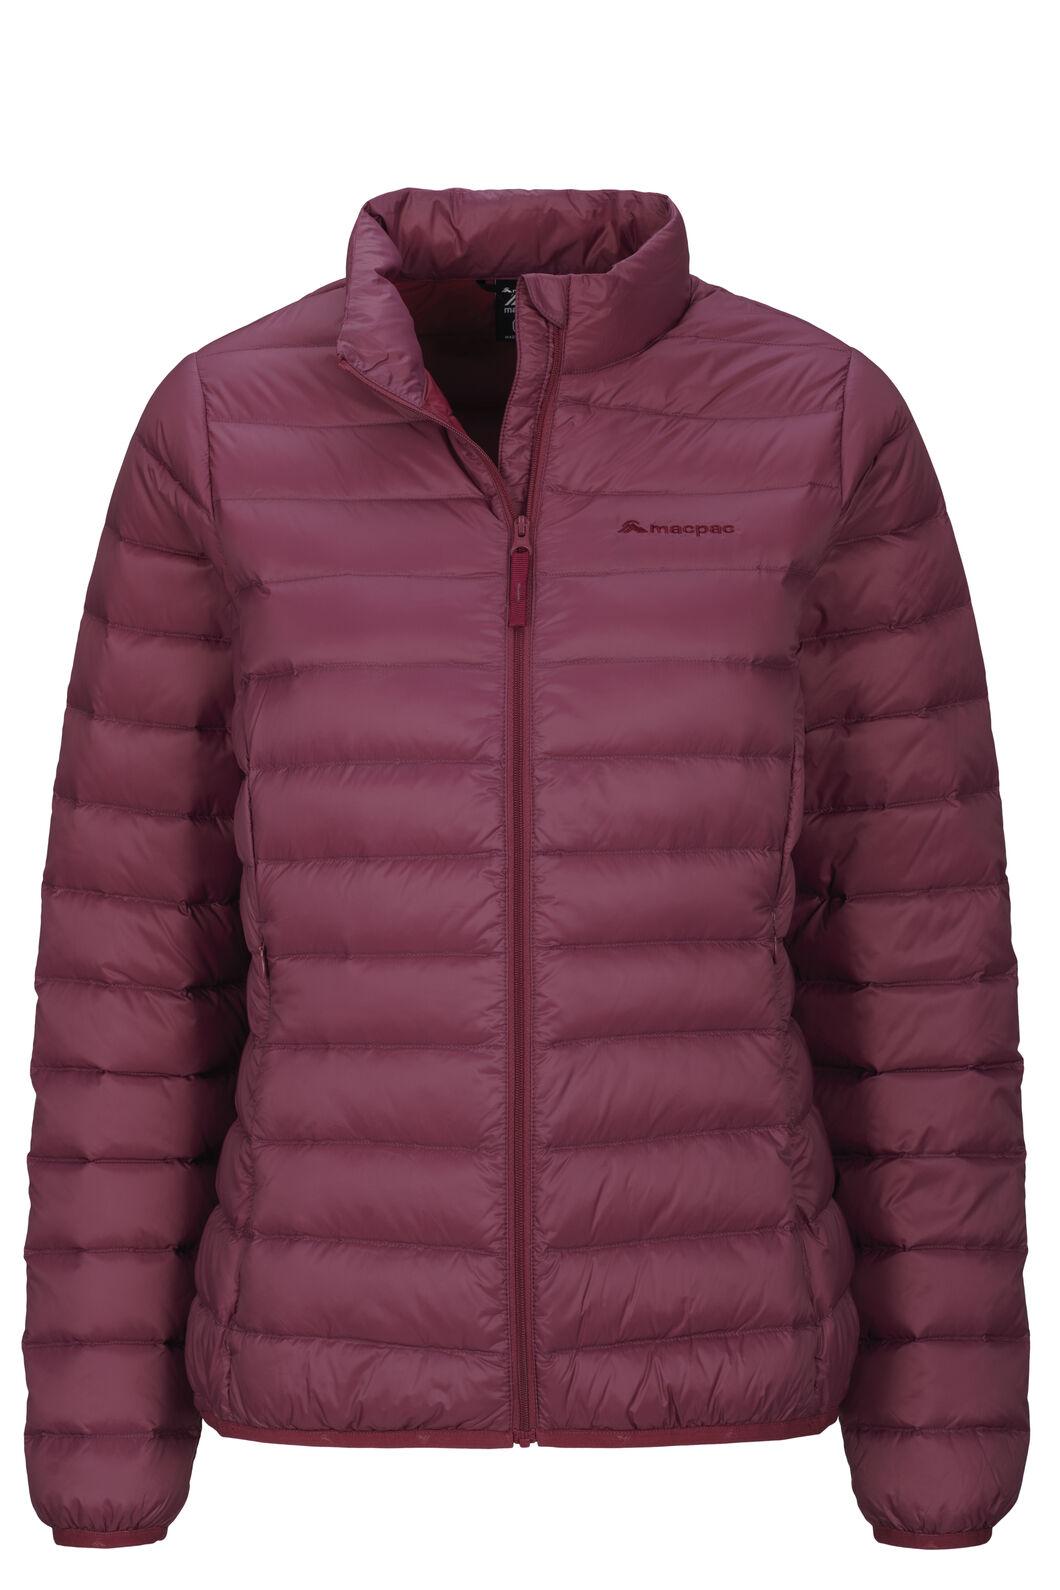 Macpac Women's Uber Light Down Jacket, Dry Rose, hi-res